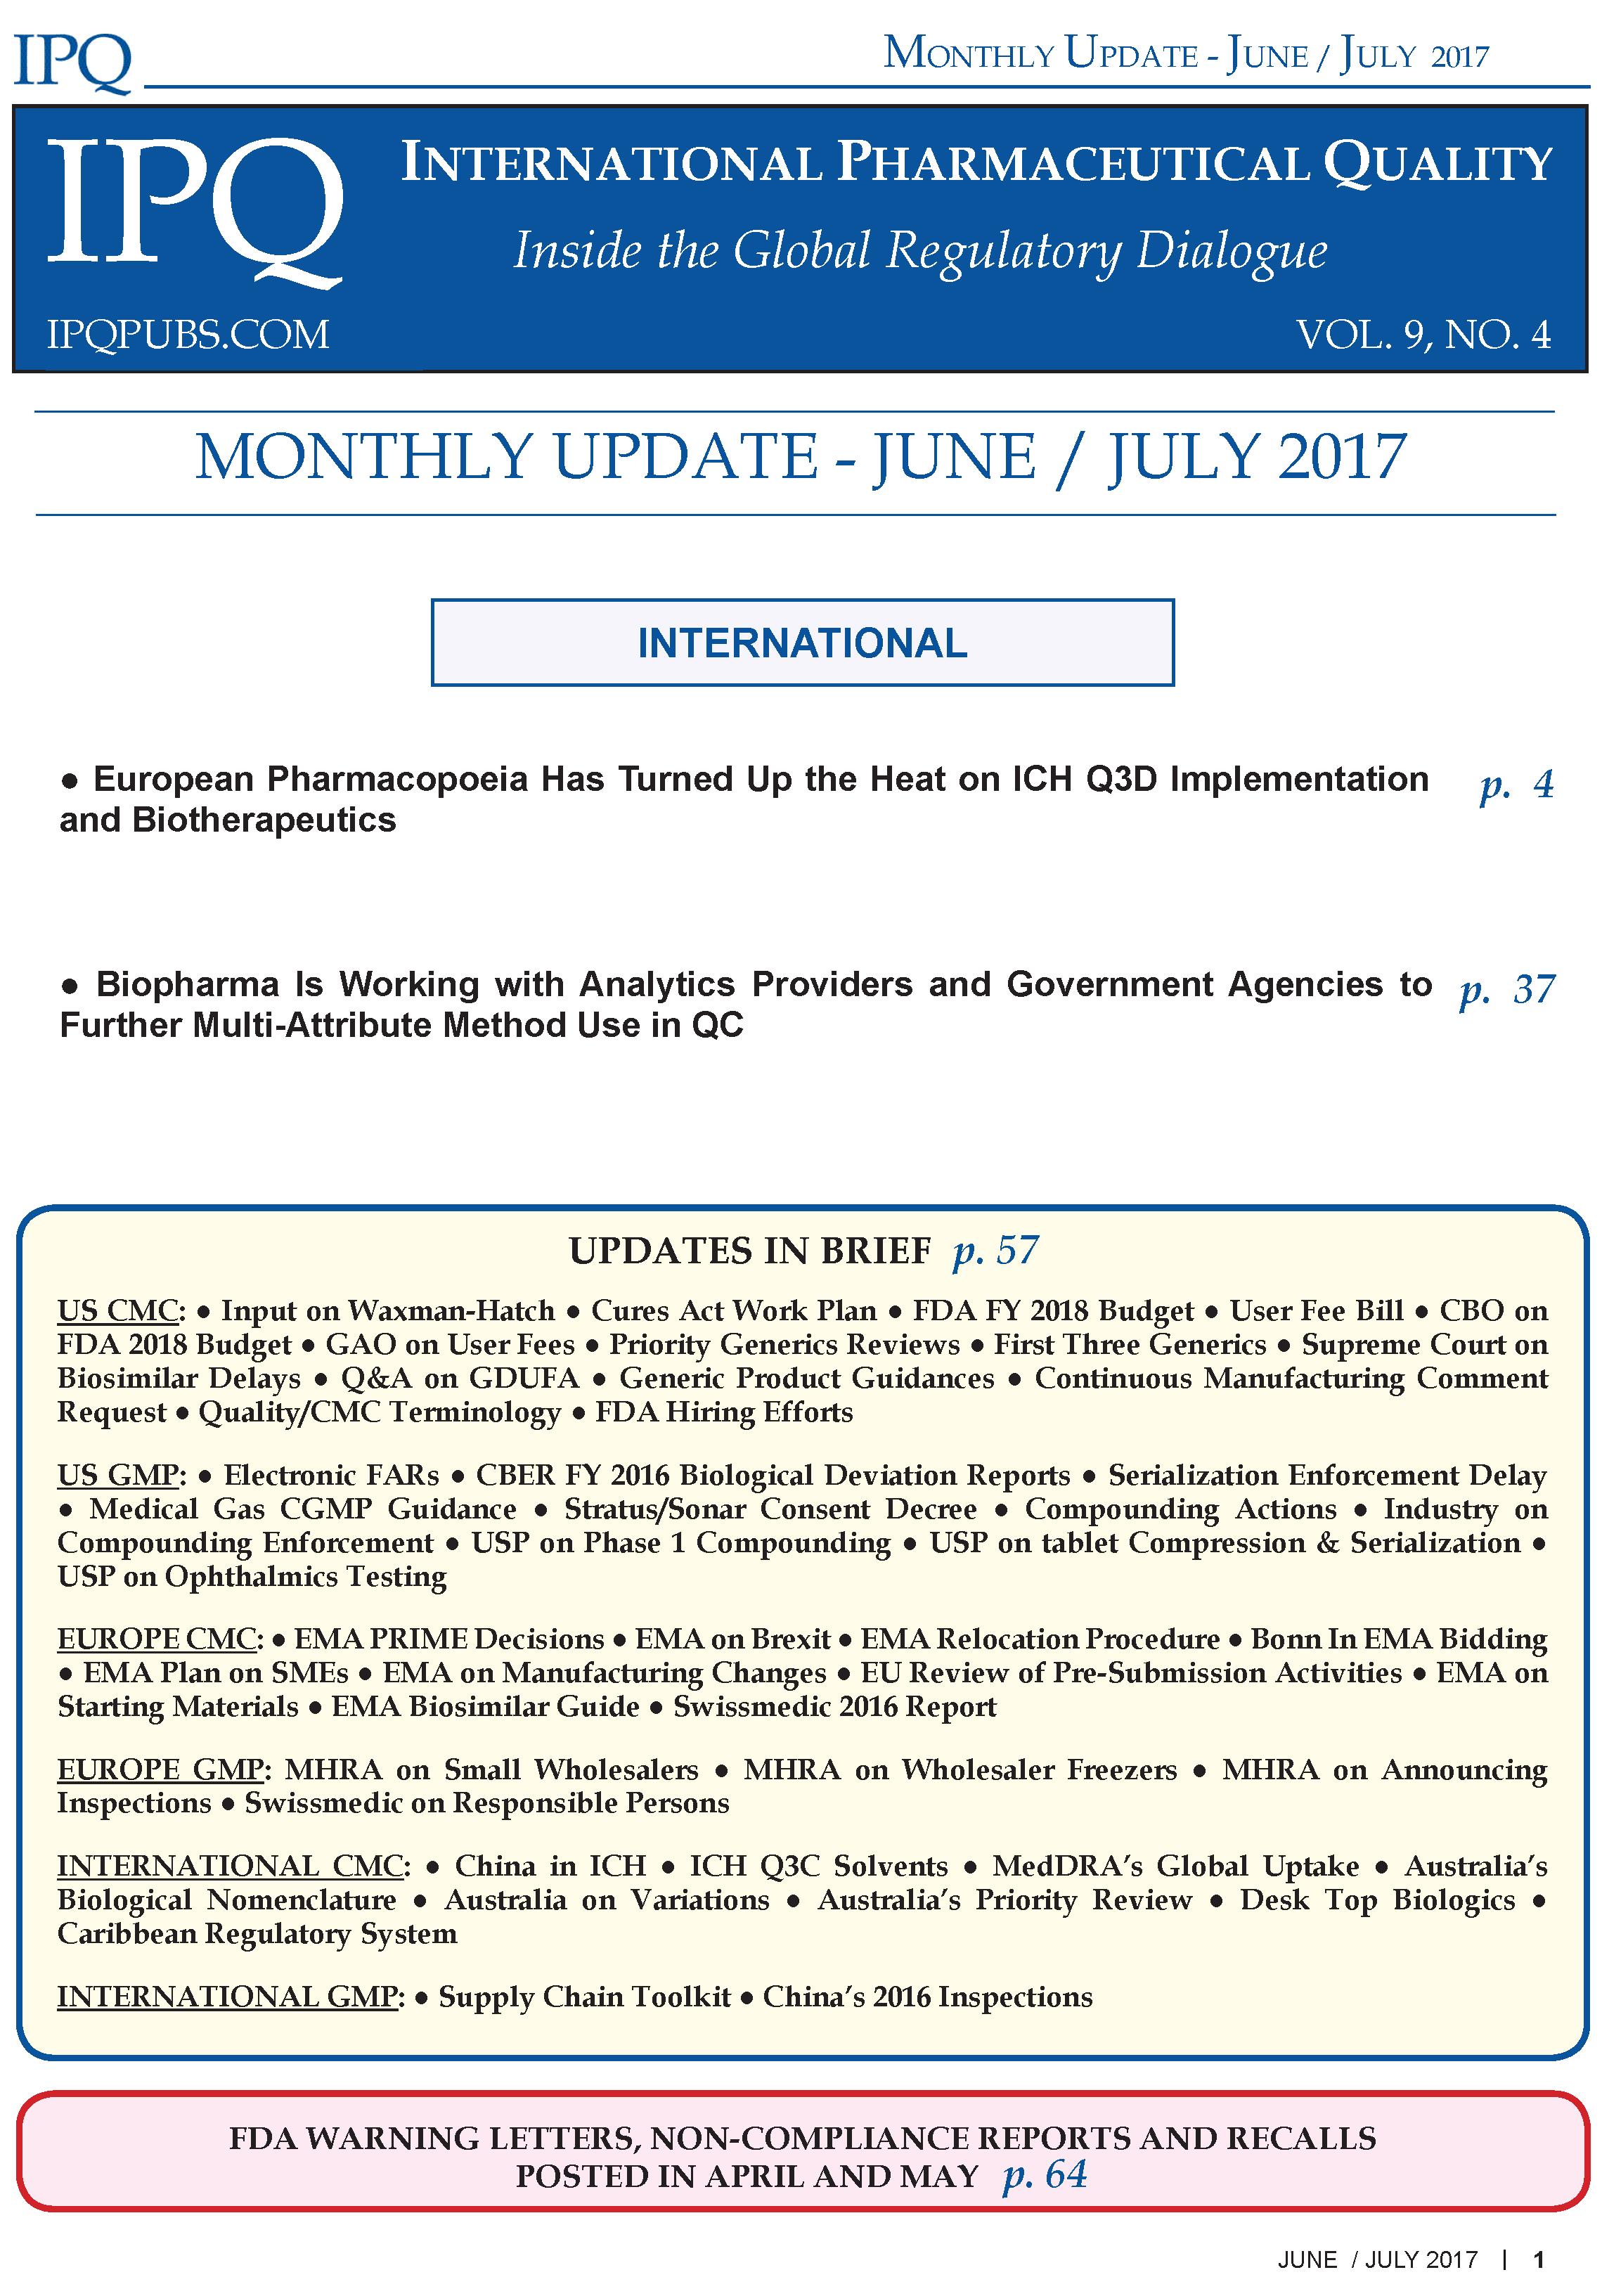 2017.June-July.v1.p. 1-3 1